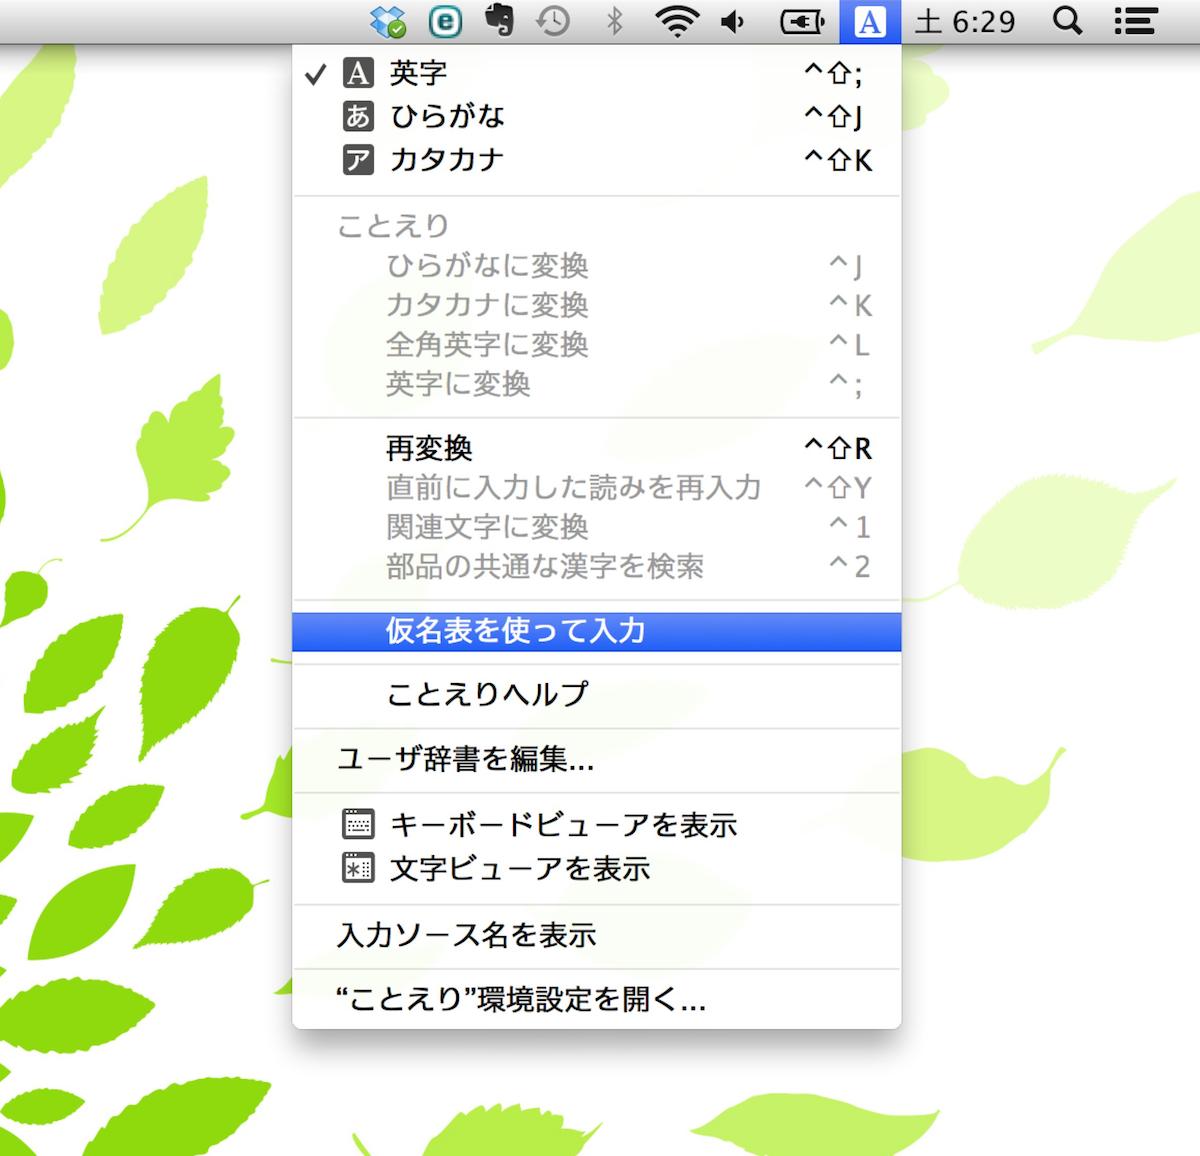 【OS X】Macのことえりで、半角カタカナを入力する方法